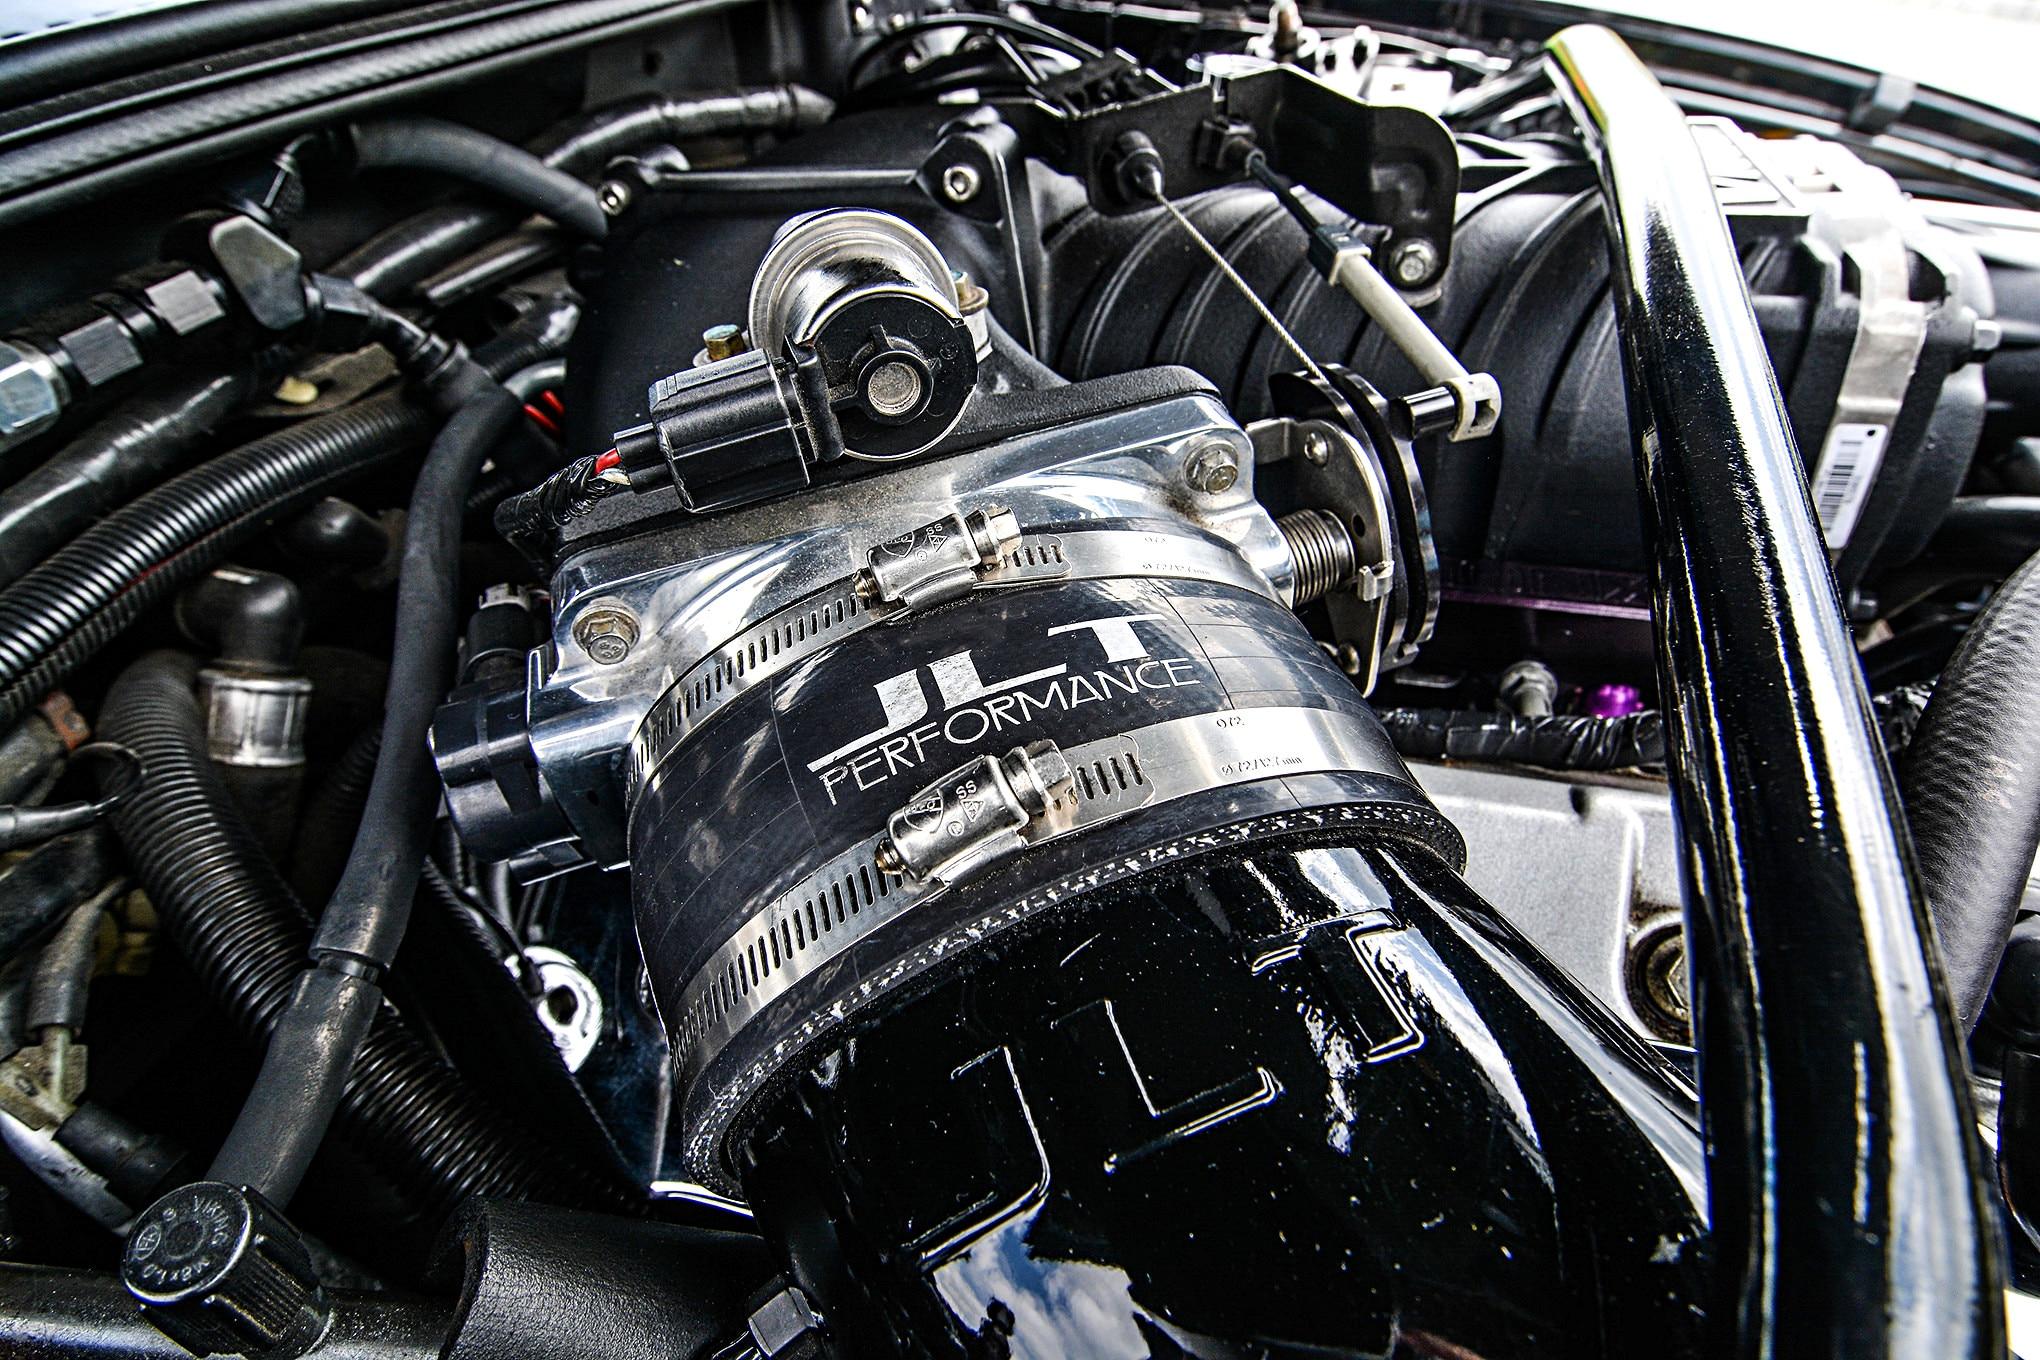 Carlos Cobra 6 2003 Ford Mustang Terminator - Photo ...